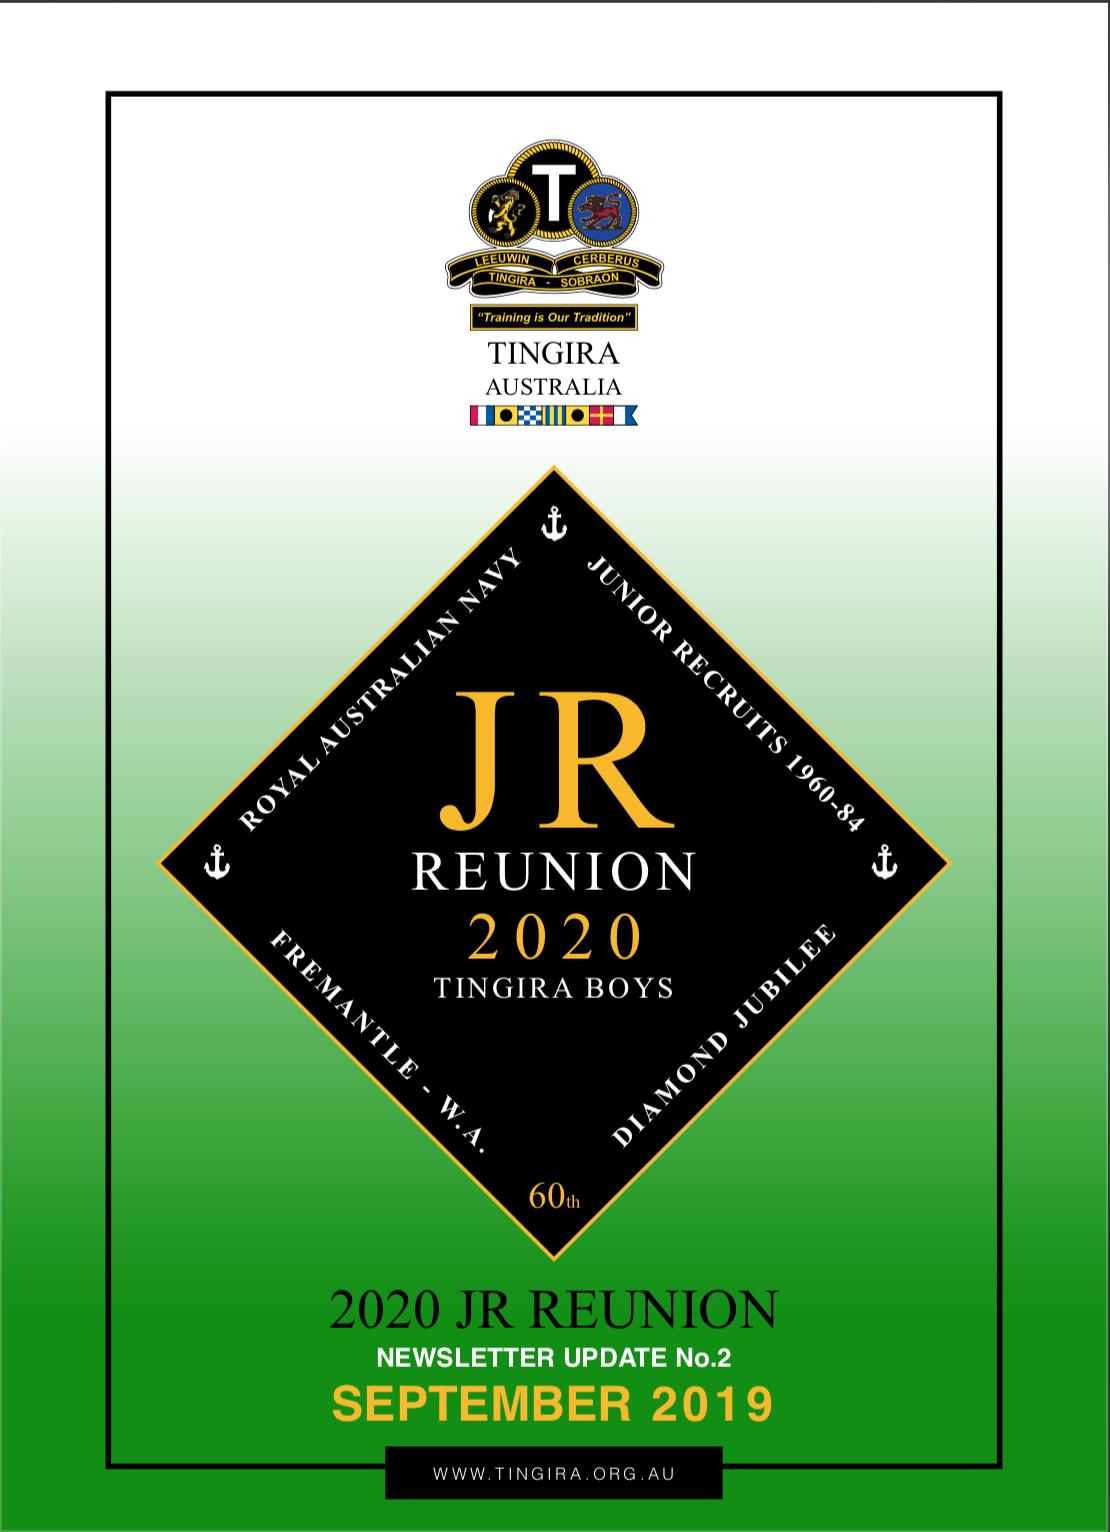 2020 JR Reunion